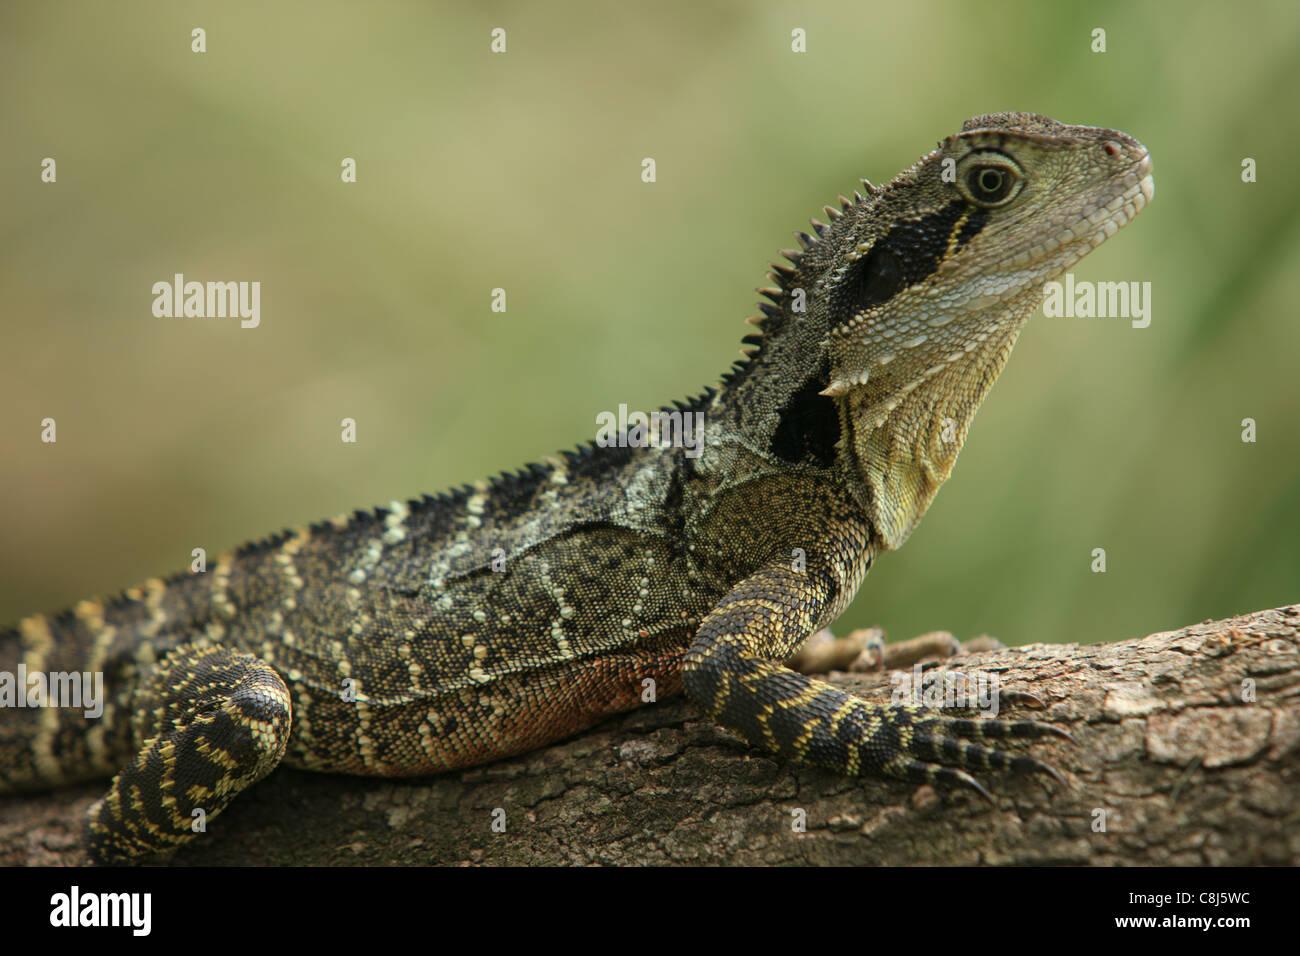 Australian Water Dragon: Australian Water Dragon, Physignathus Lesueurii, Eastern